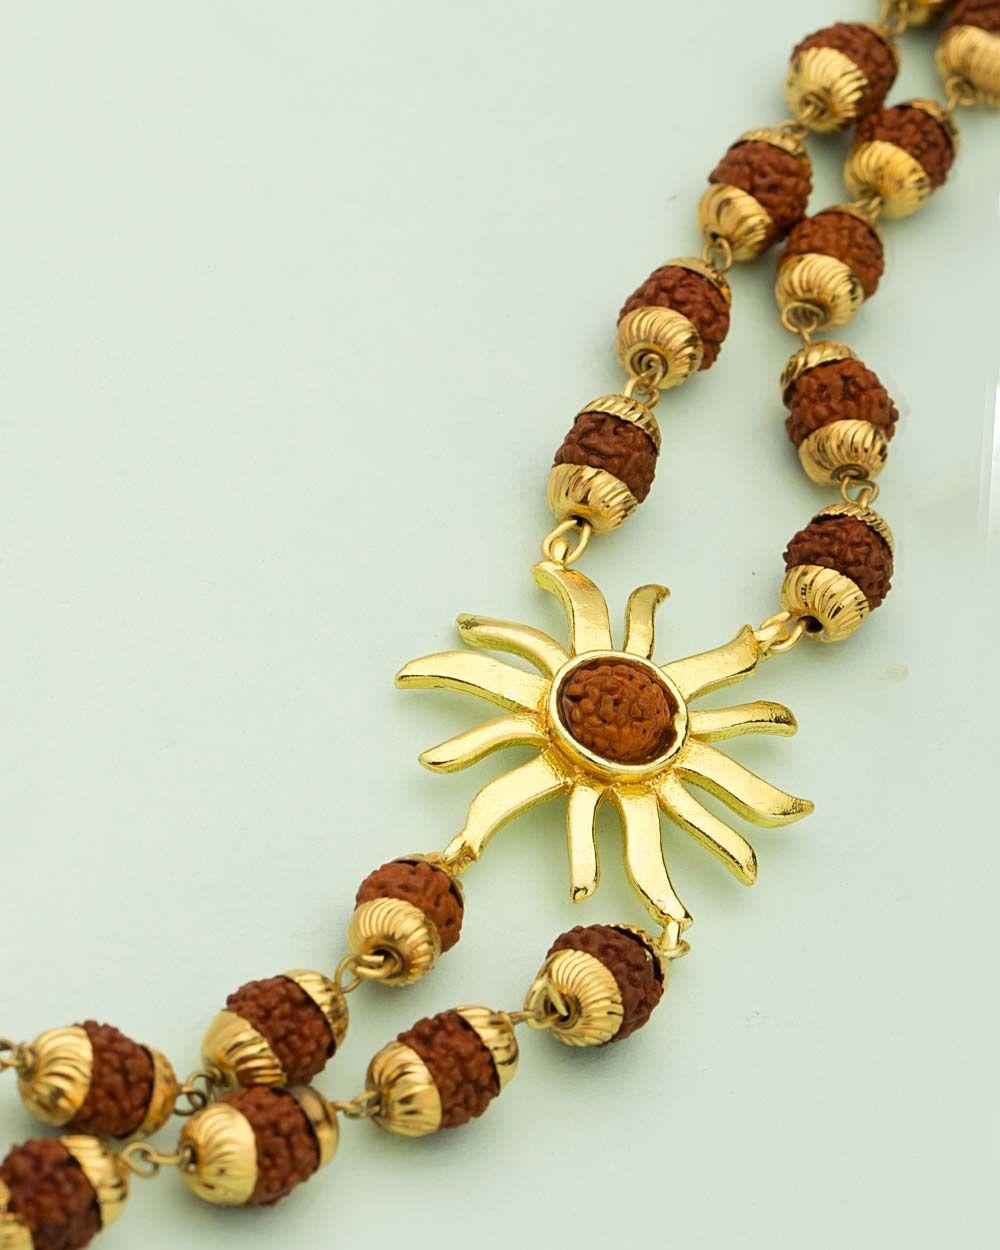 Handmade Ethnic-Tribal Necklace Boho Jewelry Rudraksha /& Glass India  Necklace Yoga Jewelry